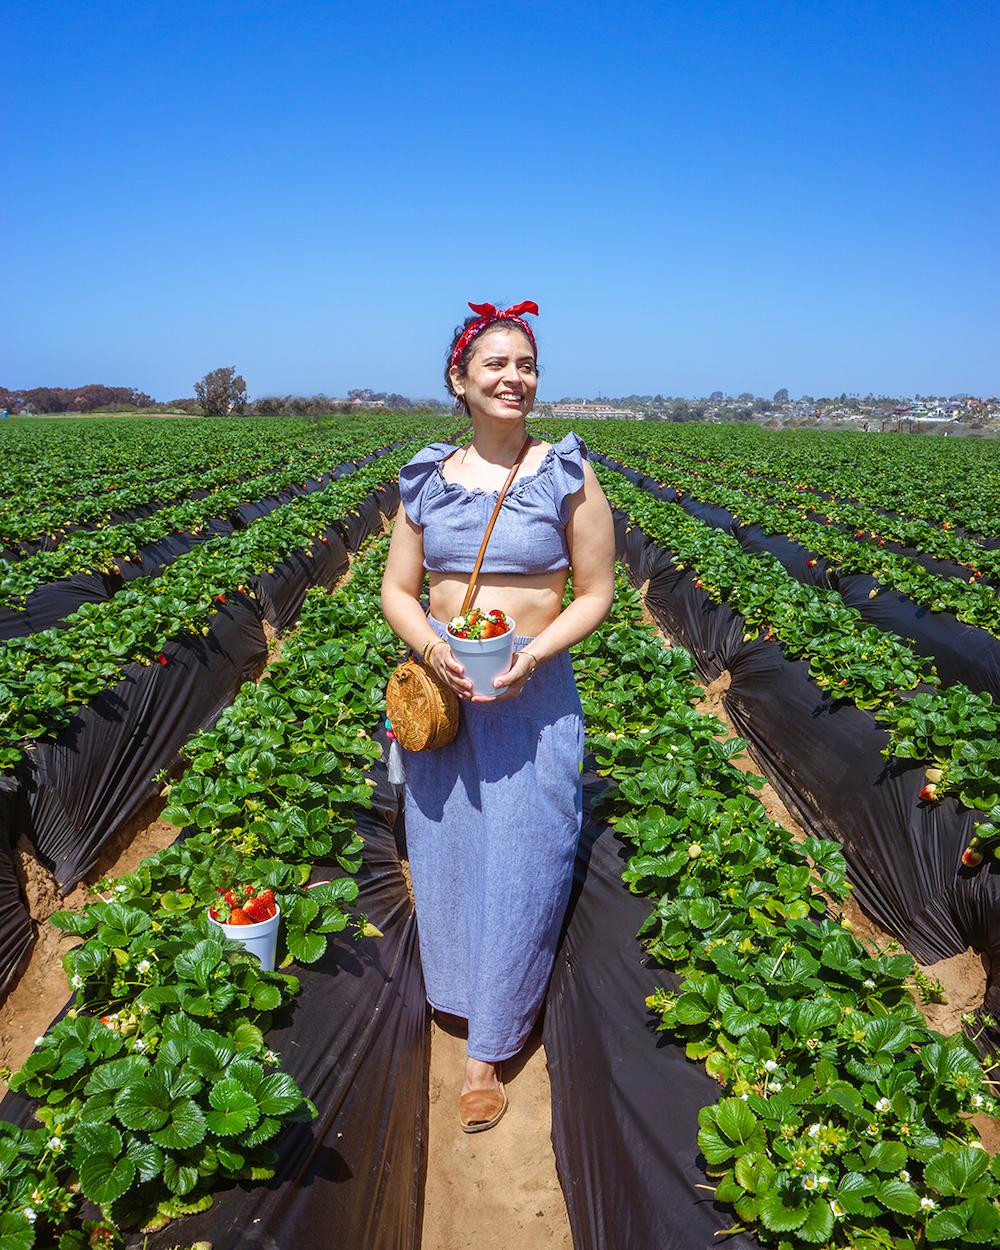 woman at carlsbad strawberry company u-picking